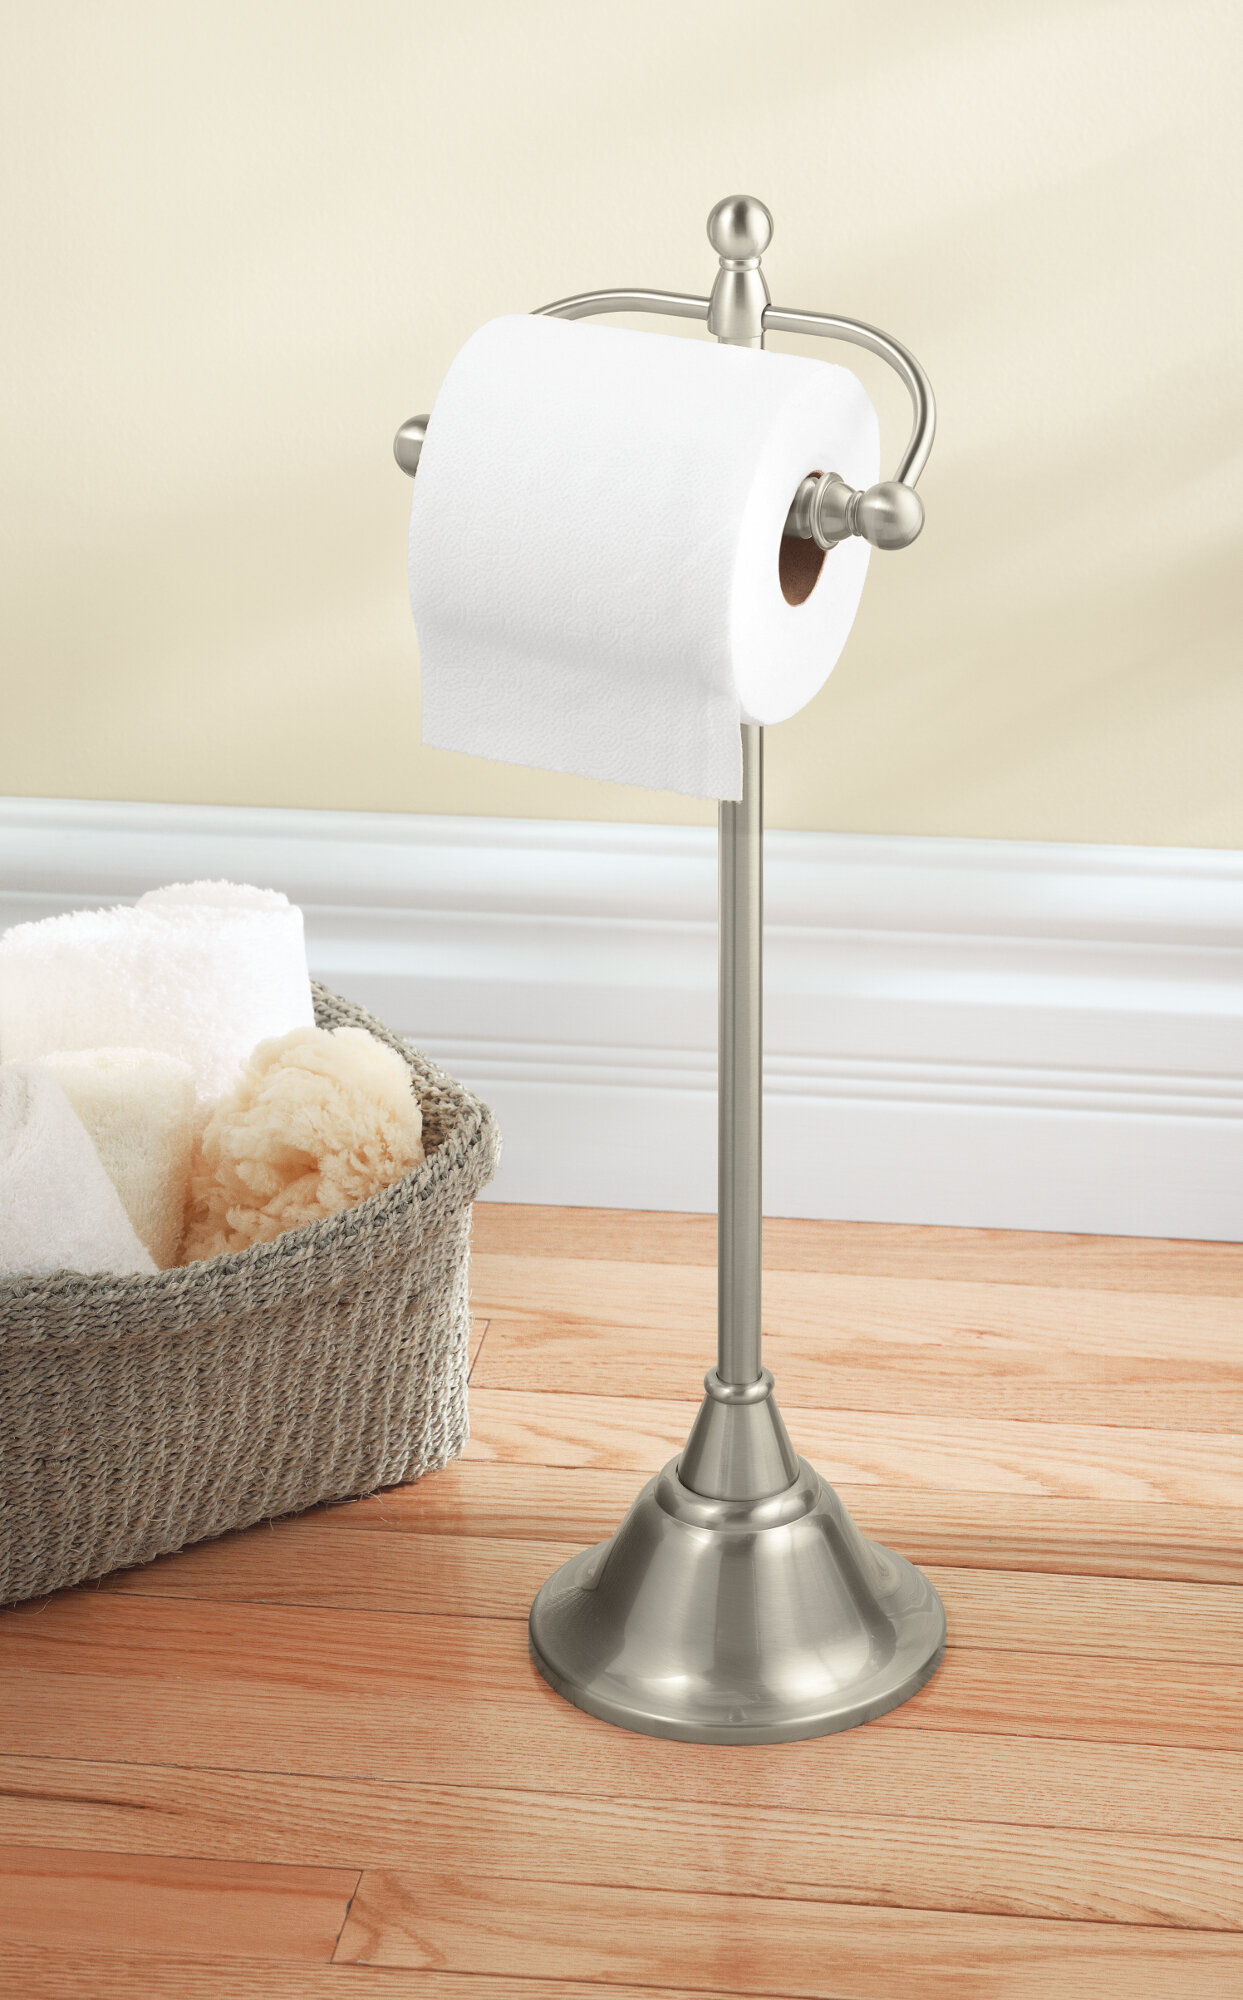 Dn6850bn Moen Sage Free Standing Toilet Paper Holder Reviews Wayfair